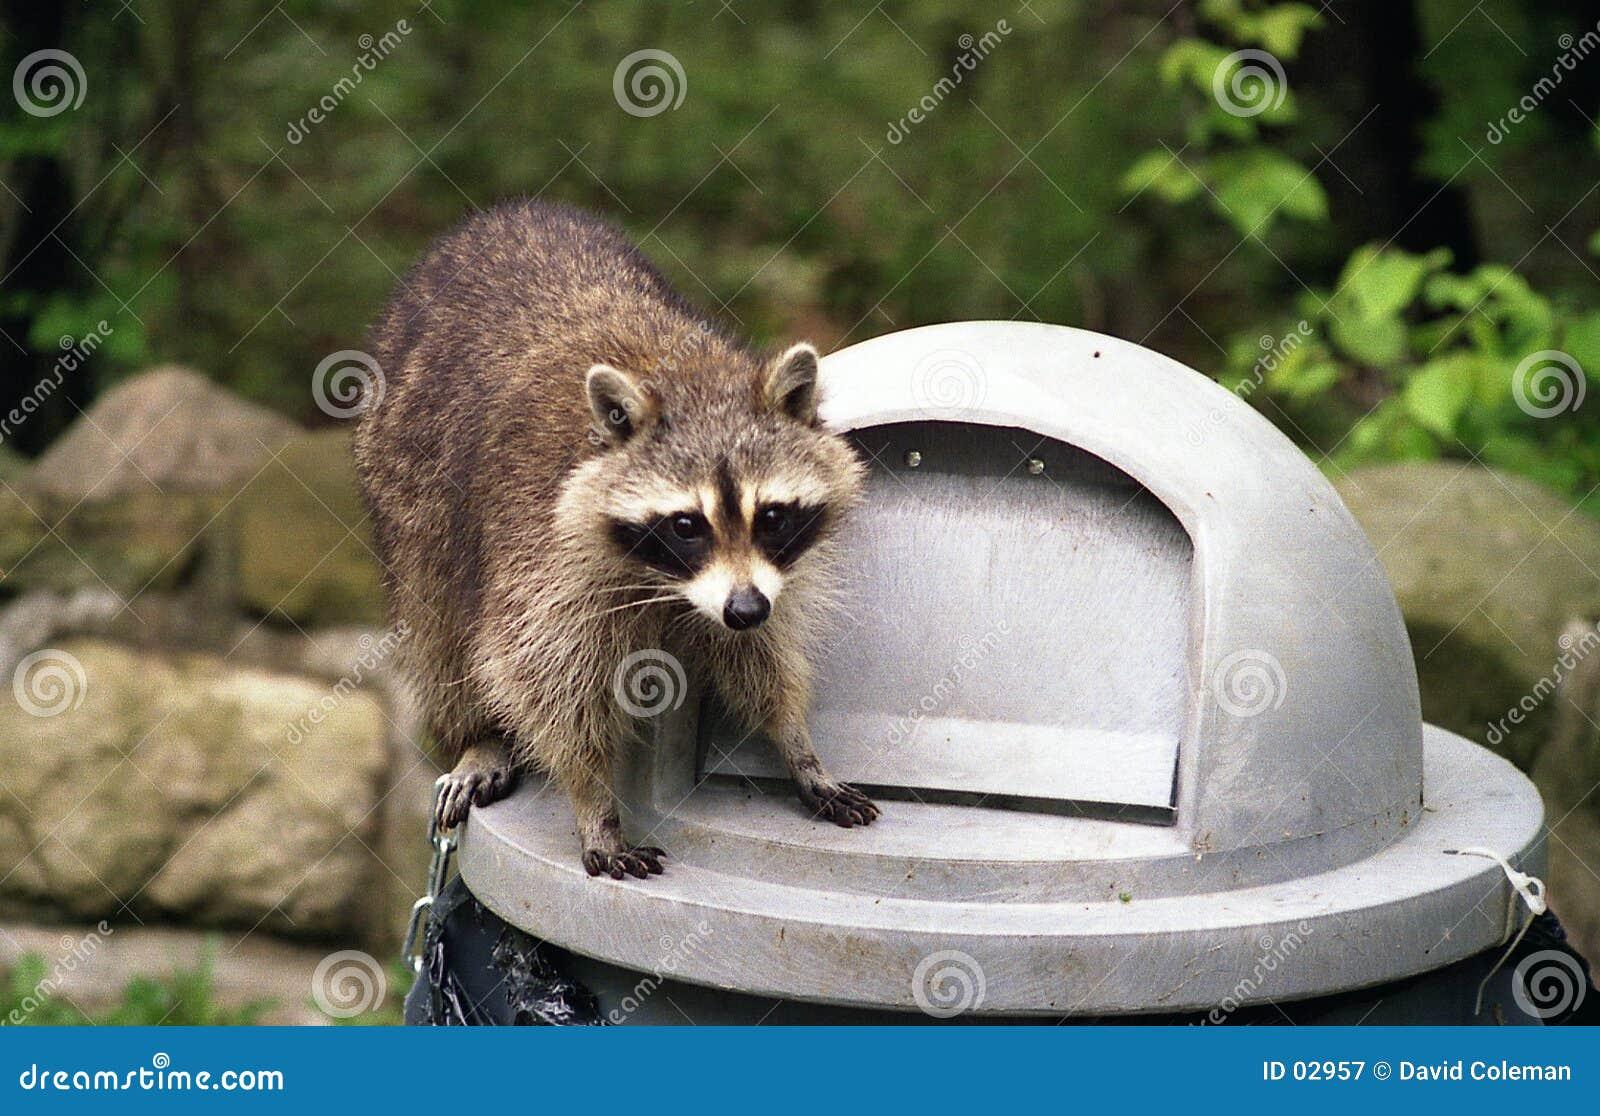 Raccoon na lata de lixo